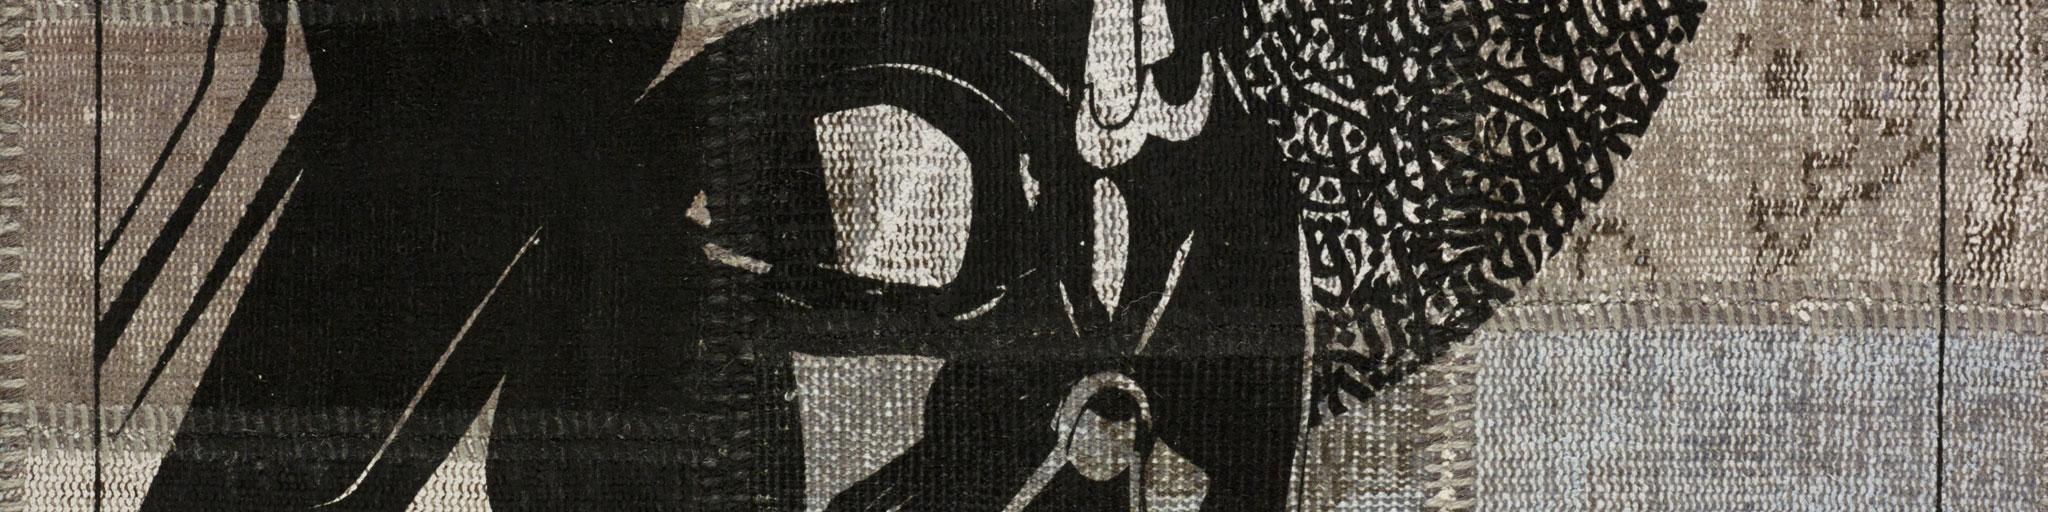 'Darth Vader' et alia | Hadi Maktabi